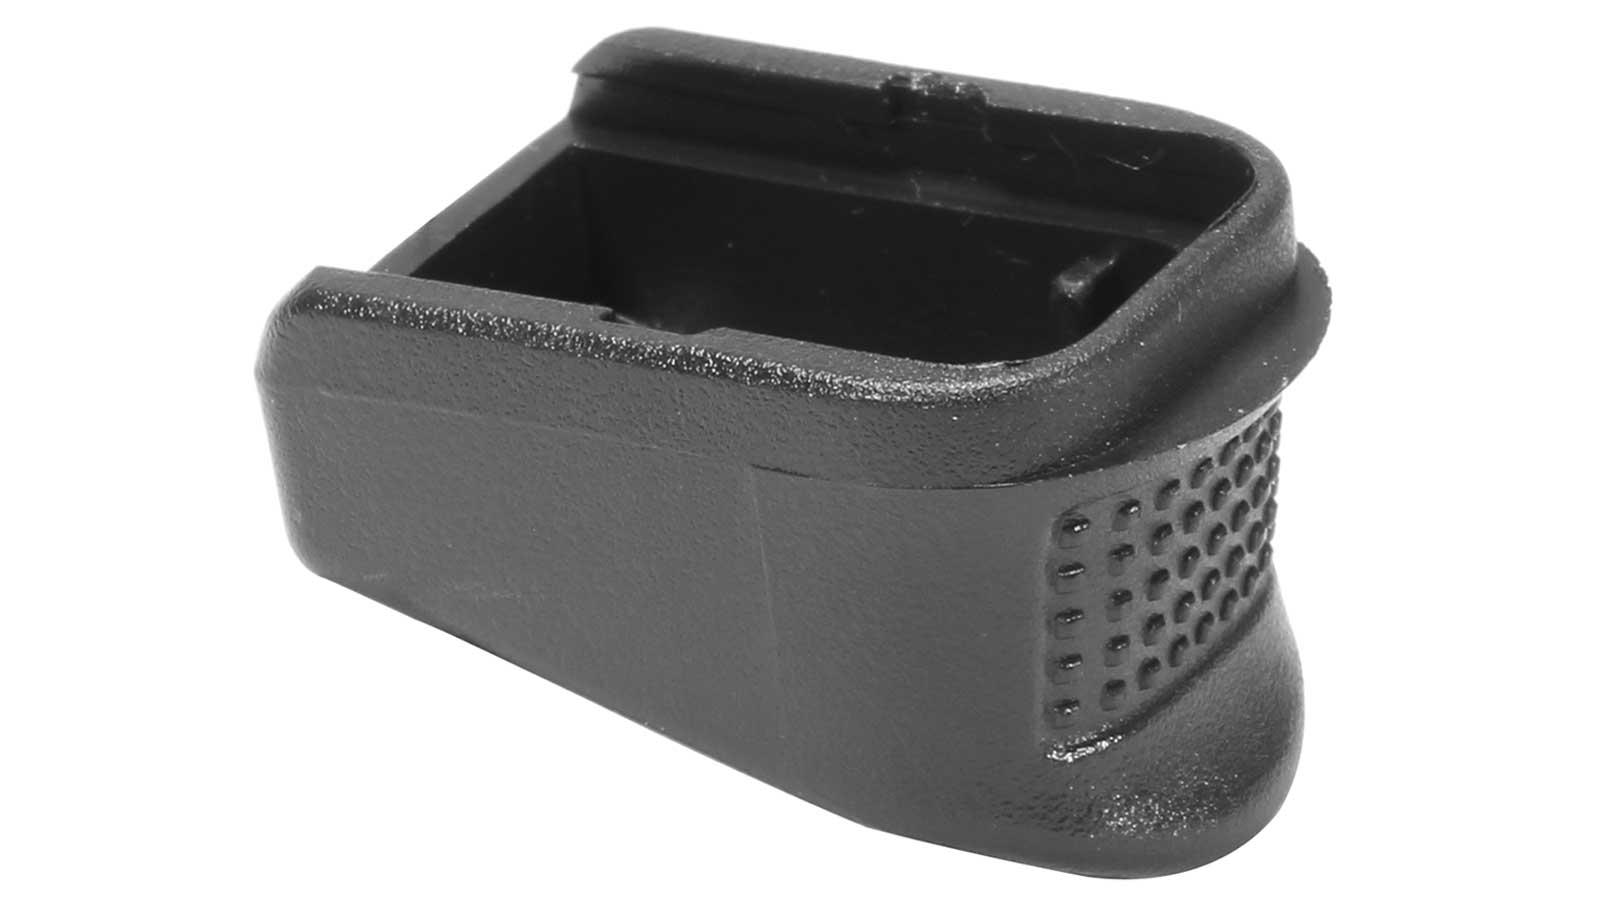 Pachmayr 03880 Grip Extender Glock 26 27 33 39(+2rds) Black Finish